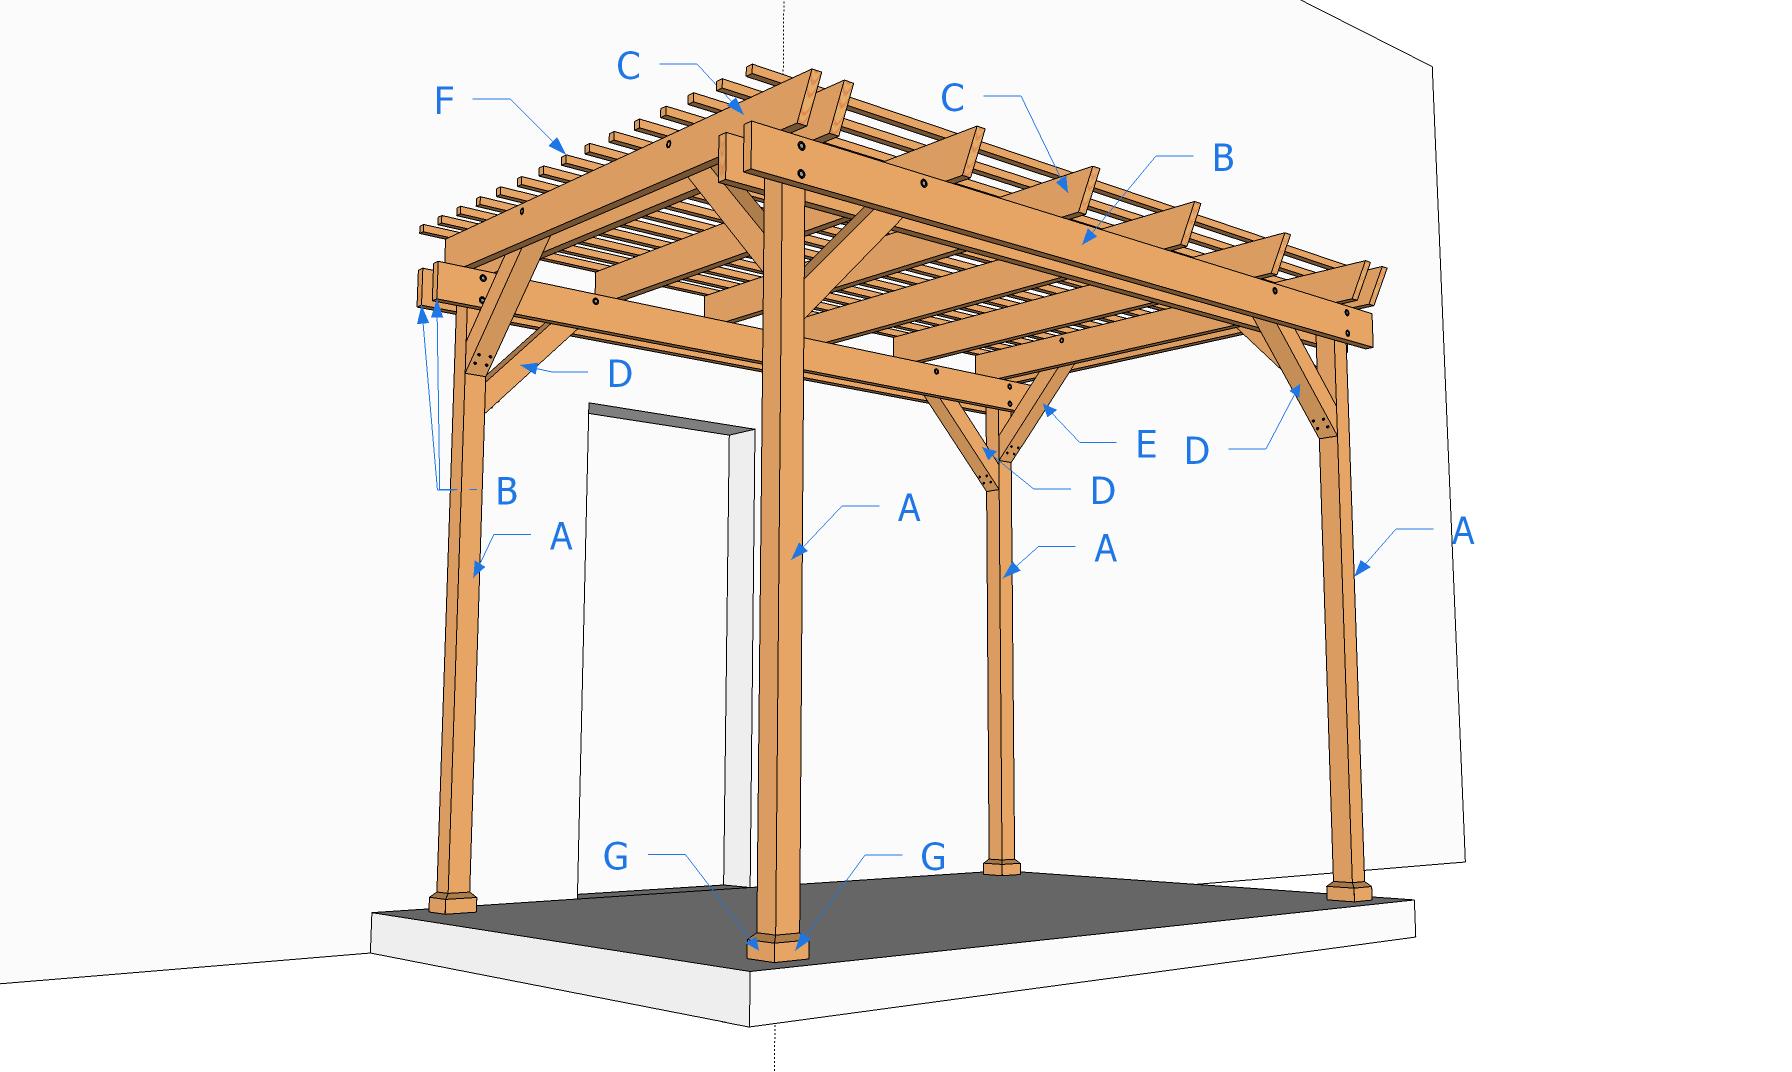 Modele de pergola en bois